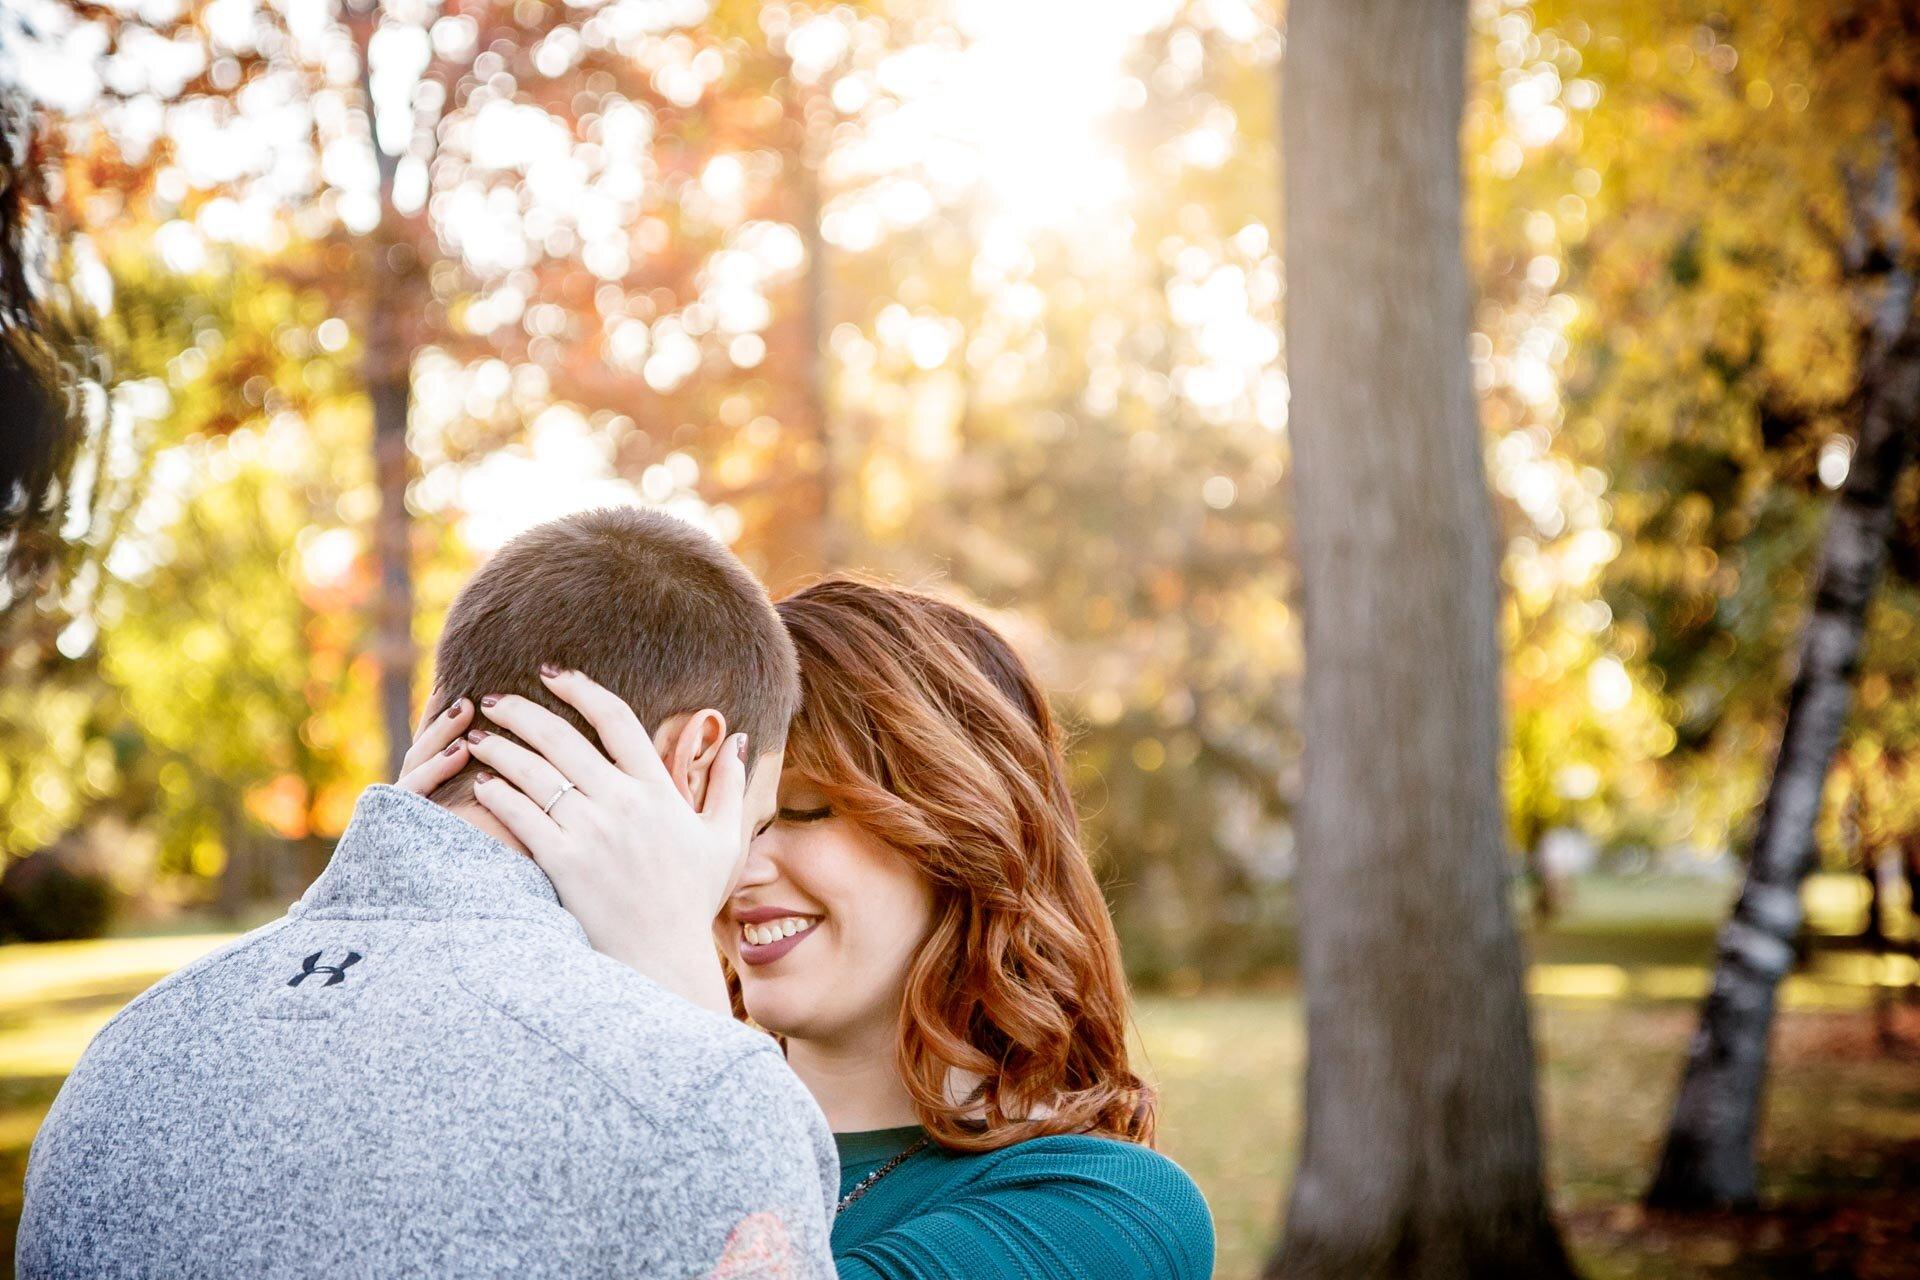 adam-shea-photography-fall-autumn-lighting-engagement-wedding-photos-adam-shea-photography-green-bay-appleton-neenah-photographer-18.jpg